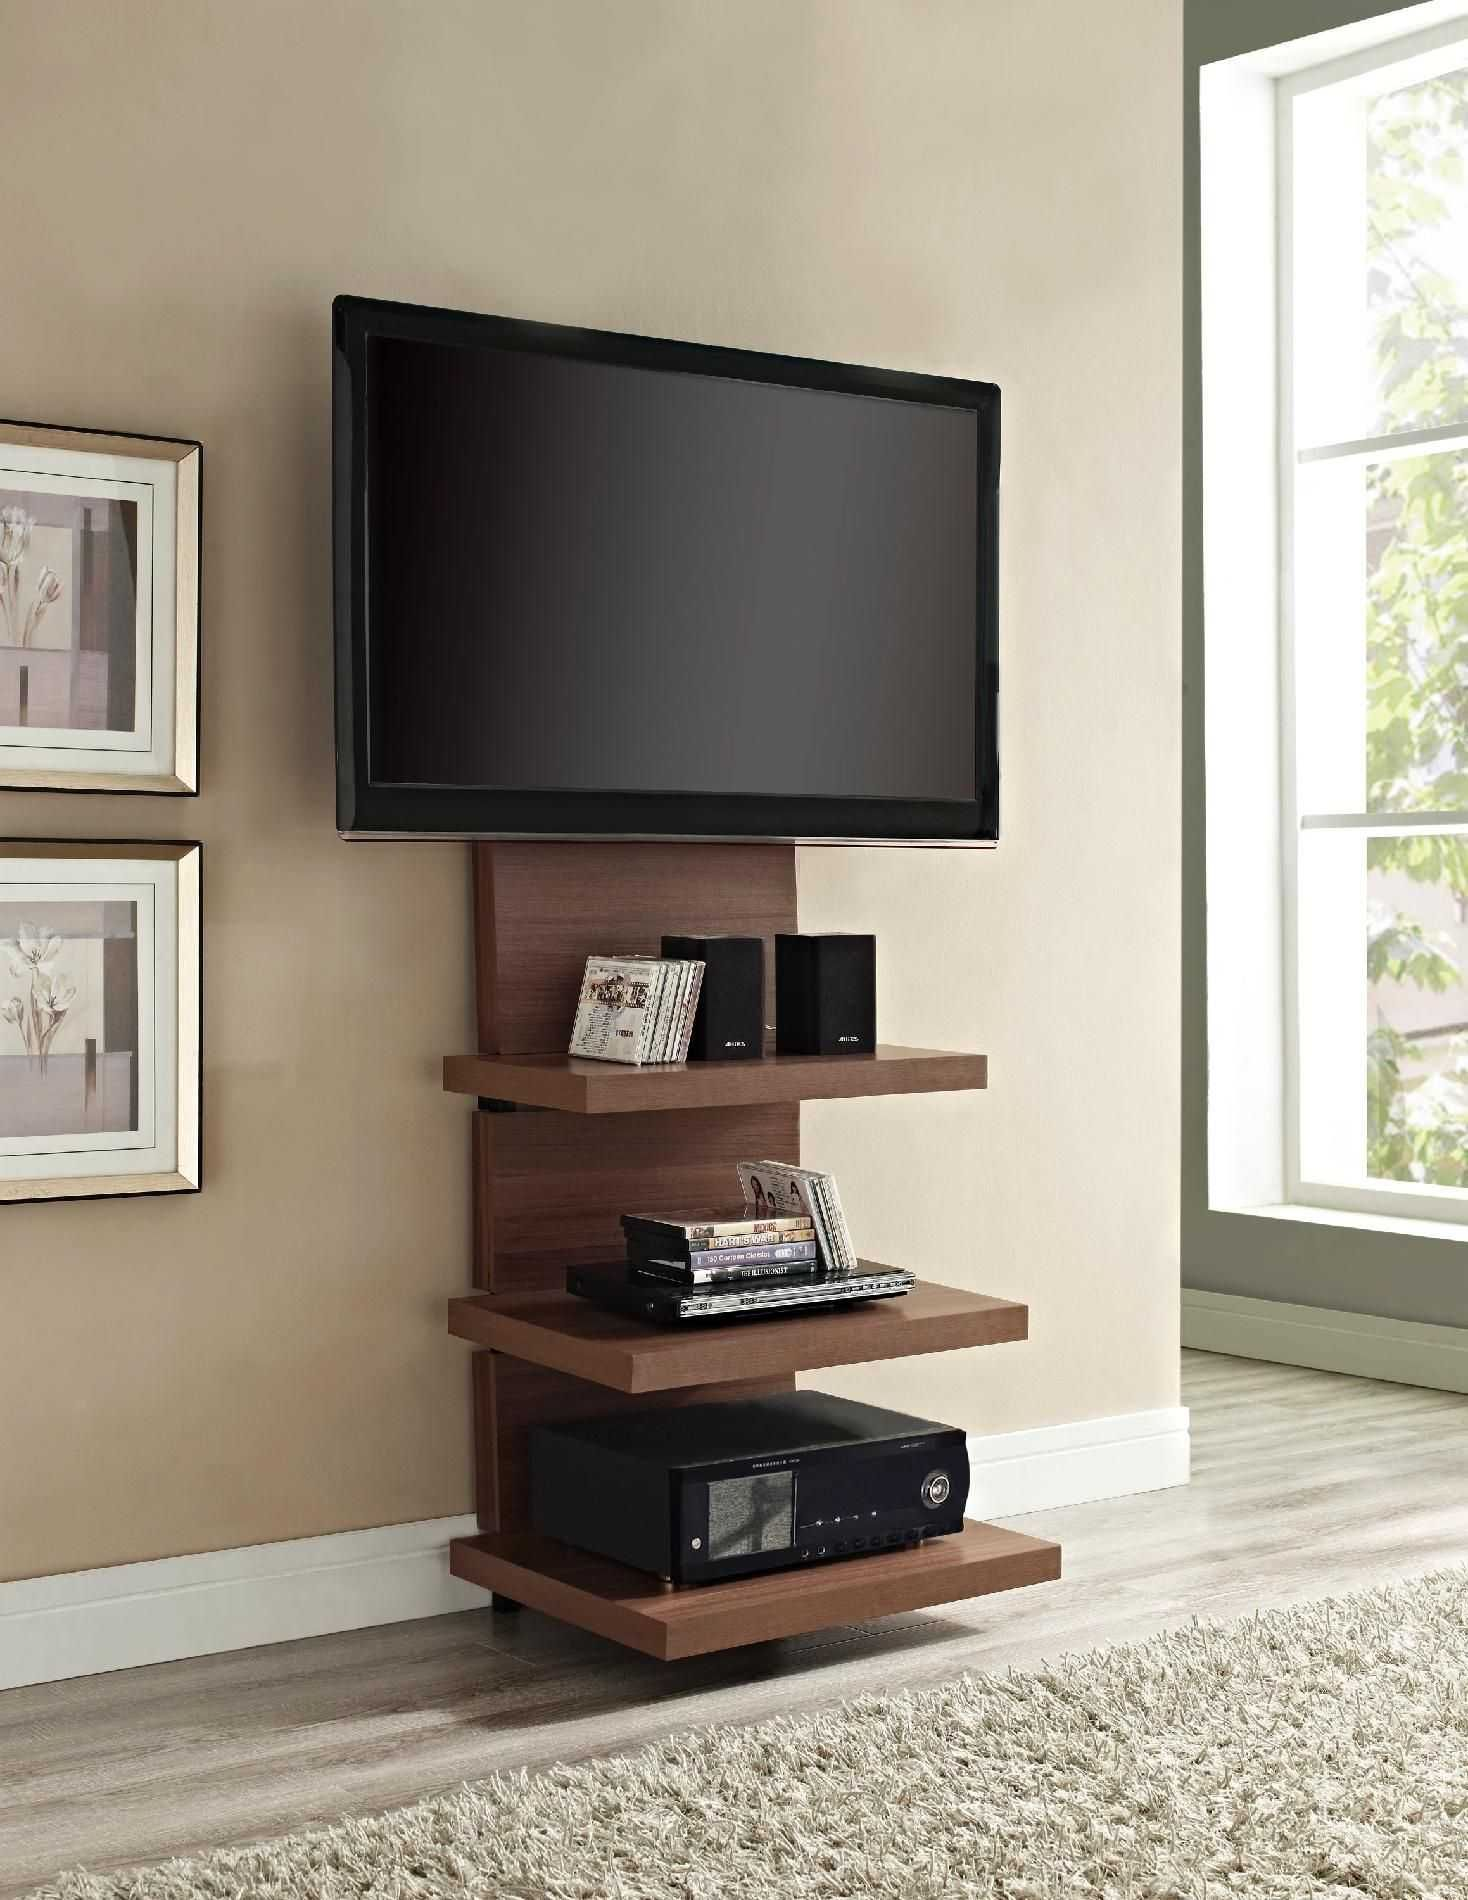 Ocultar Cables Tv Ideas En 2019 Pinterest Wall Mounted Tv Diy